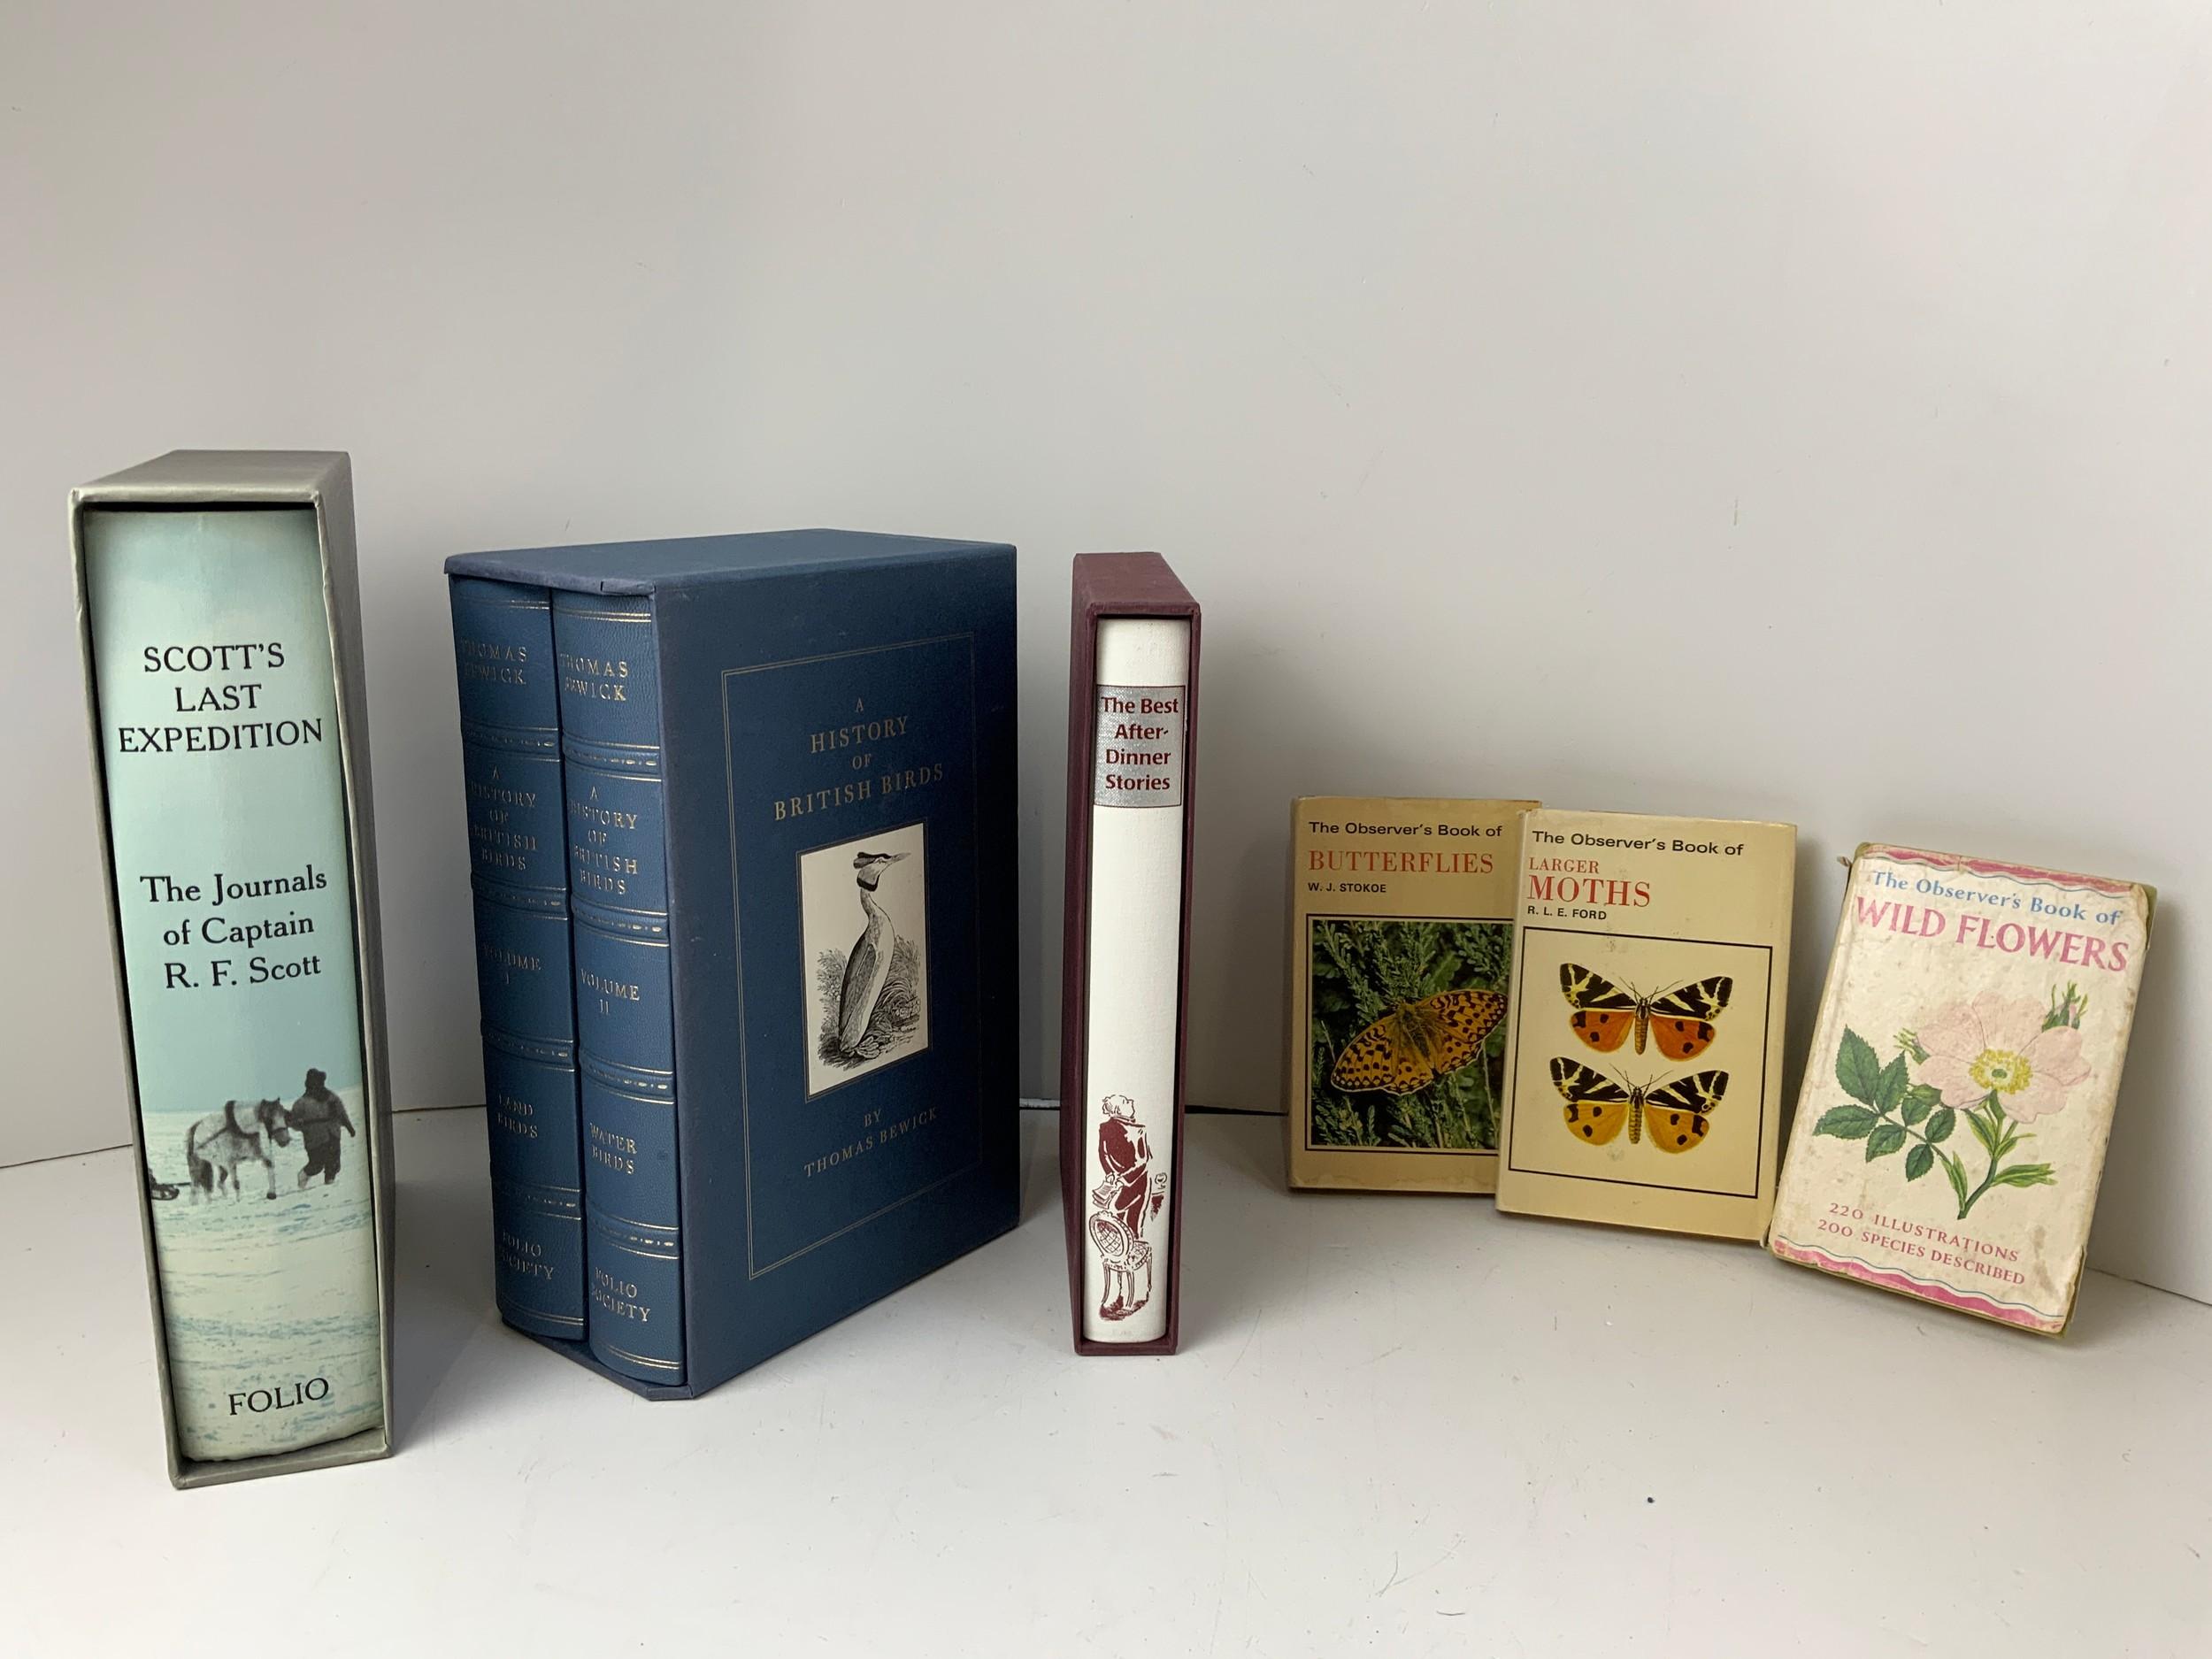 Folio Books and Observers